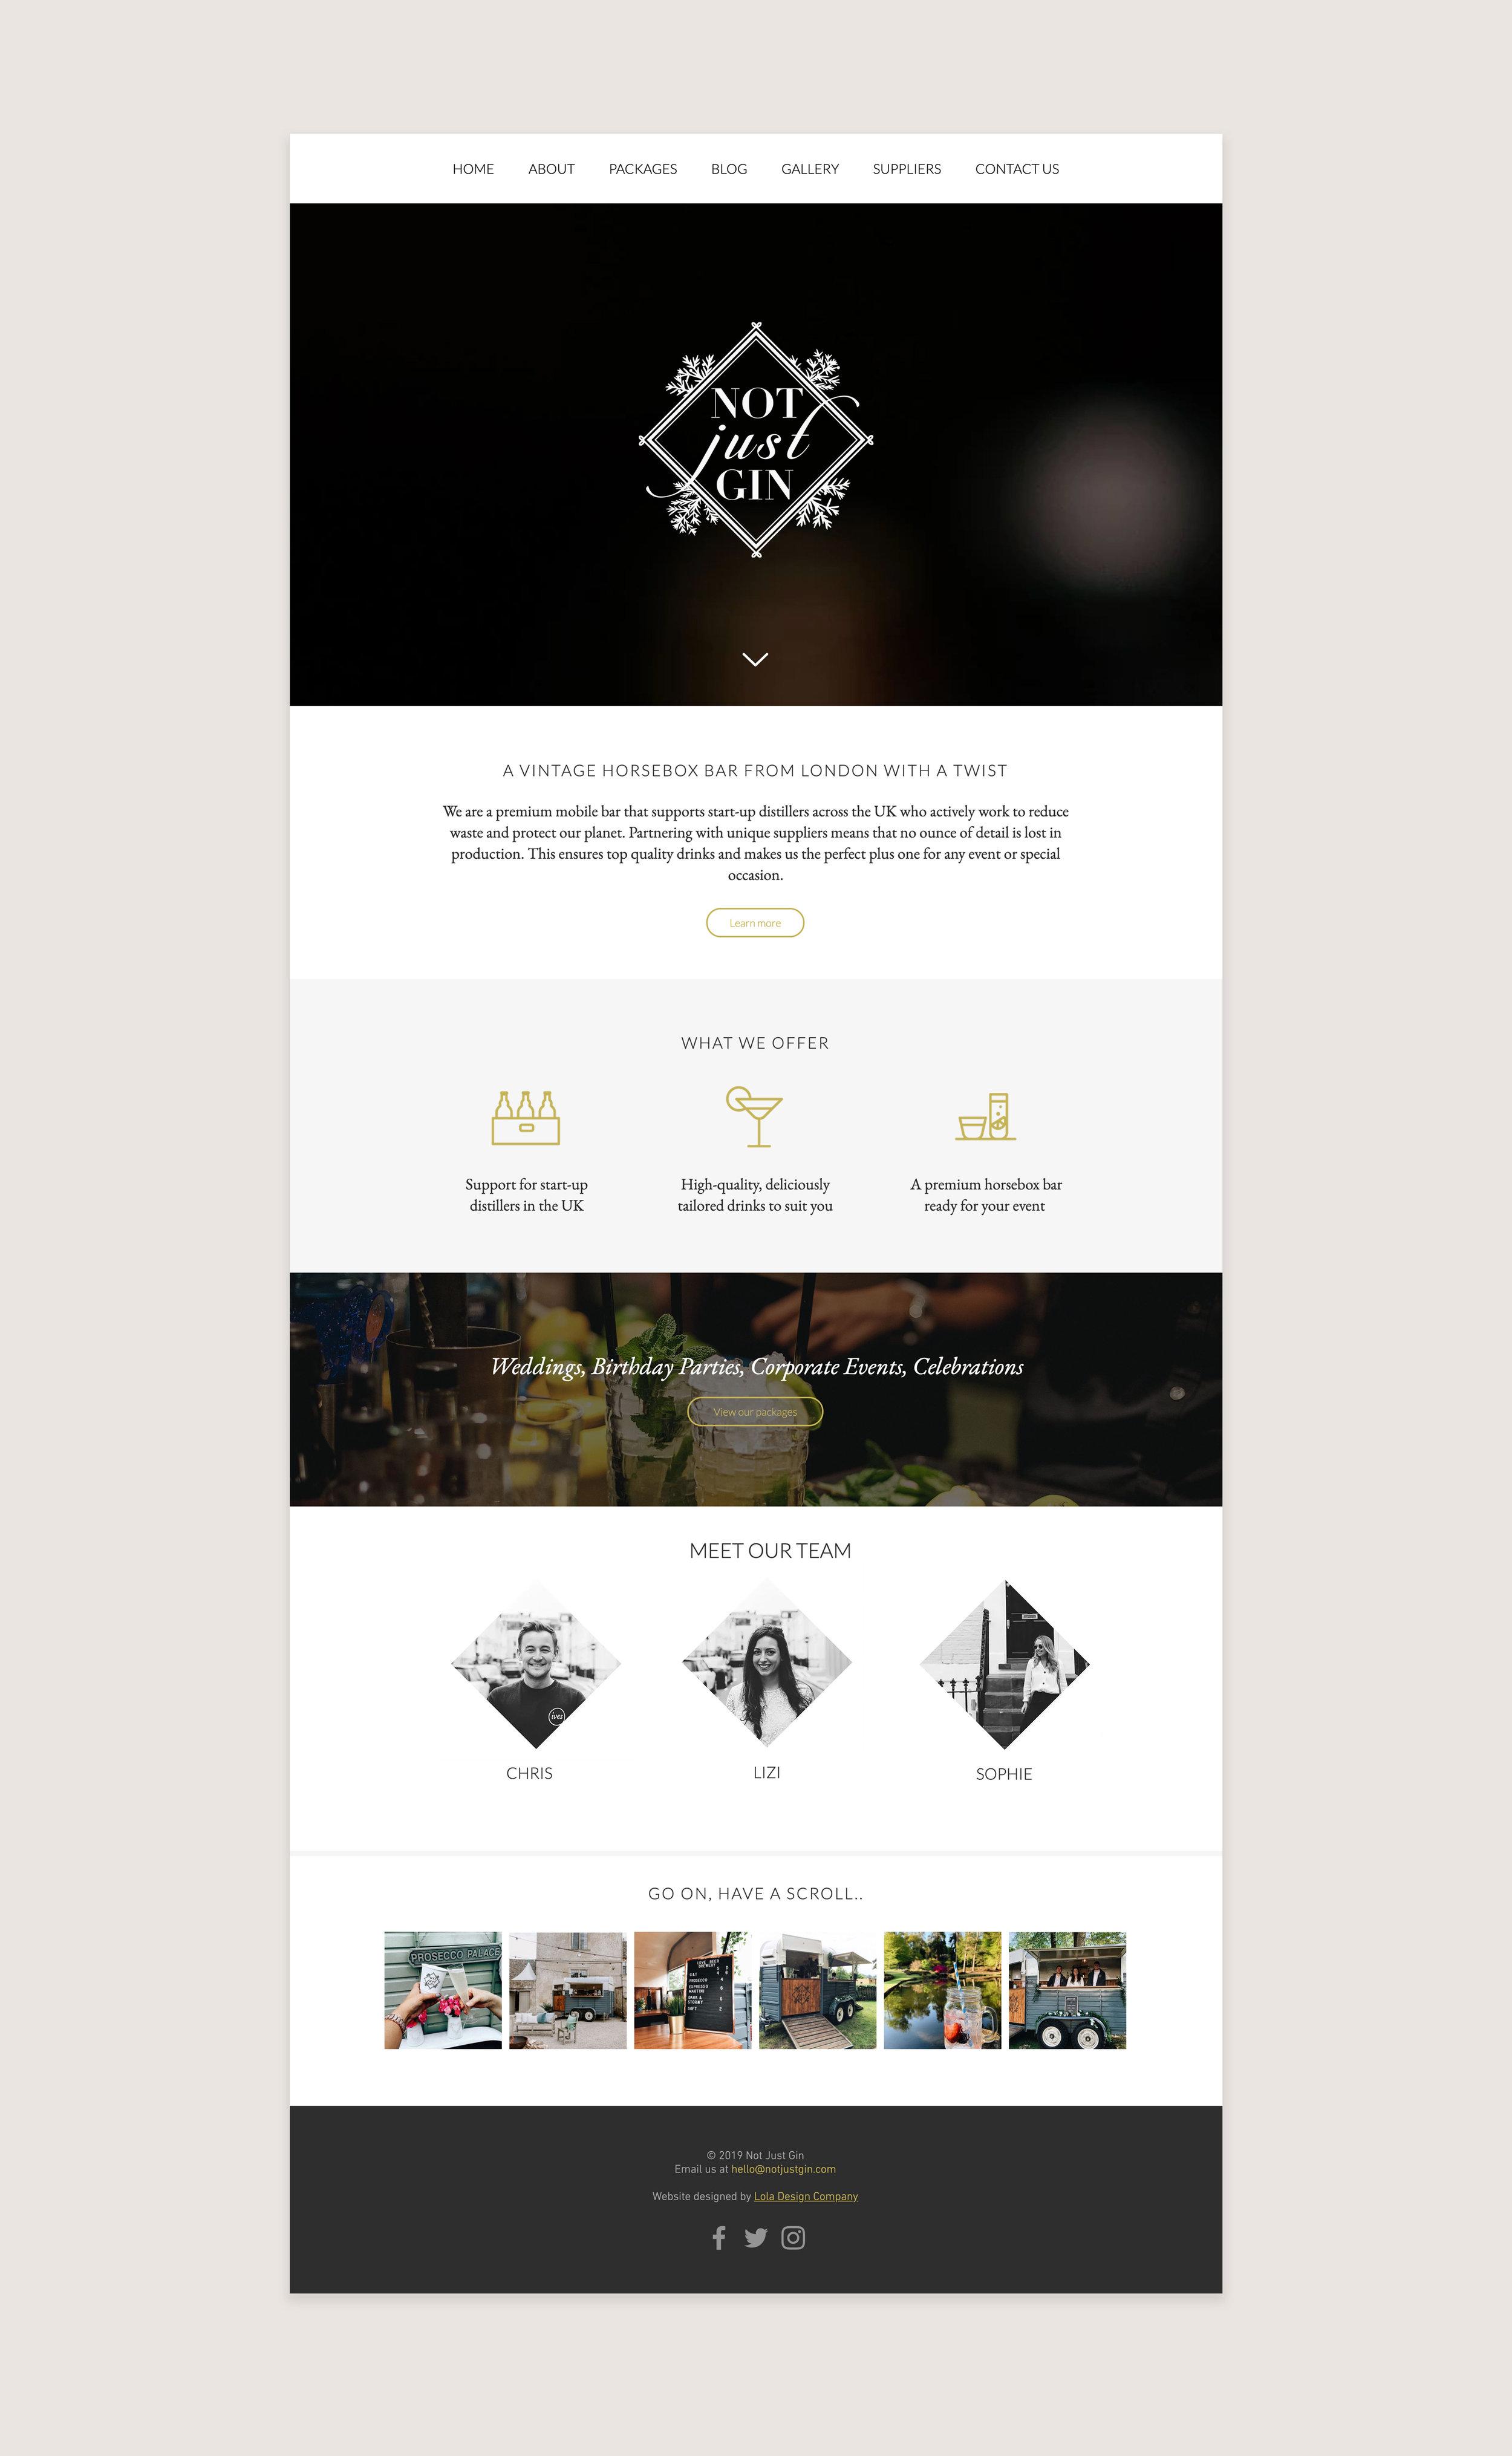 Not-Just-Gin-Website-Branding-Lola-Design-Company-Freelance-Graphic-Designer-London-Mockup.jpg